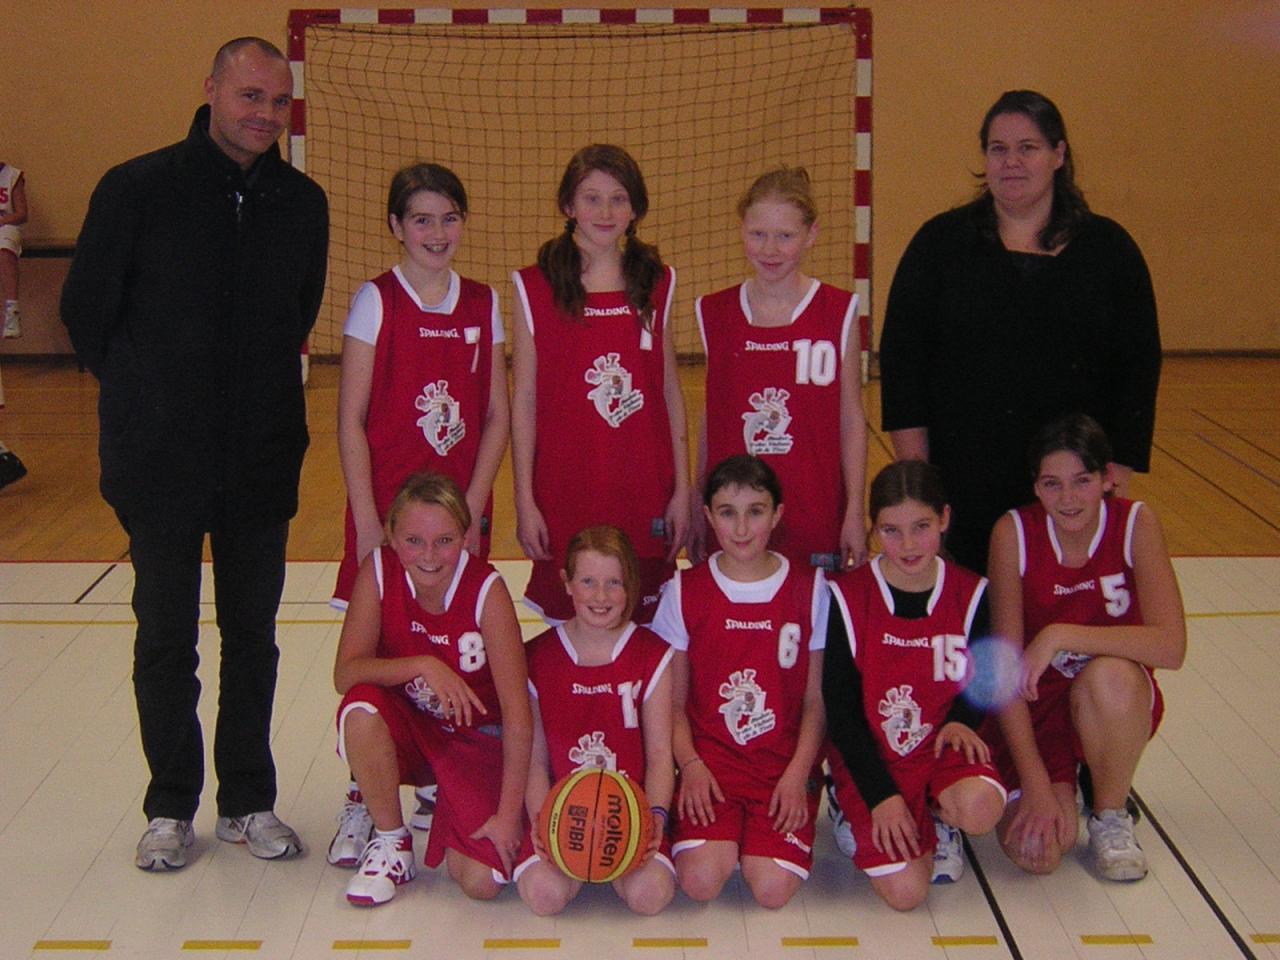 BF2 2007-2008